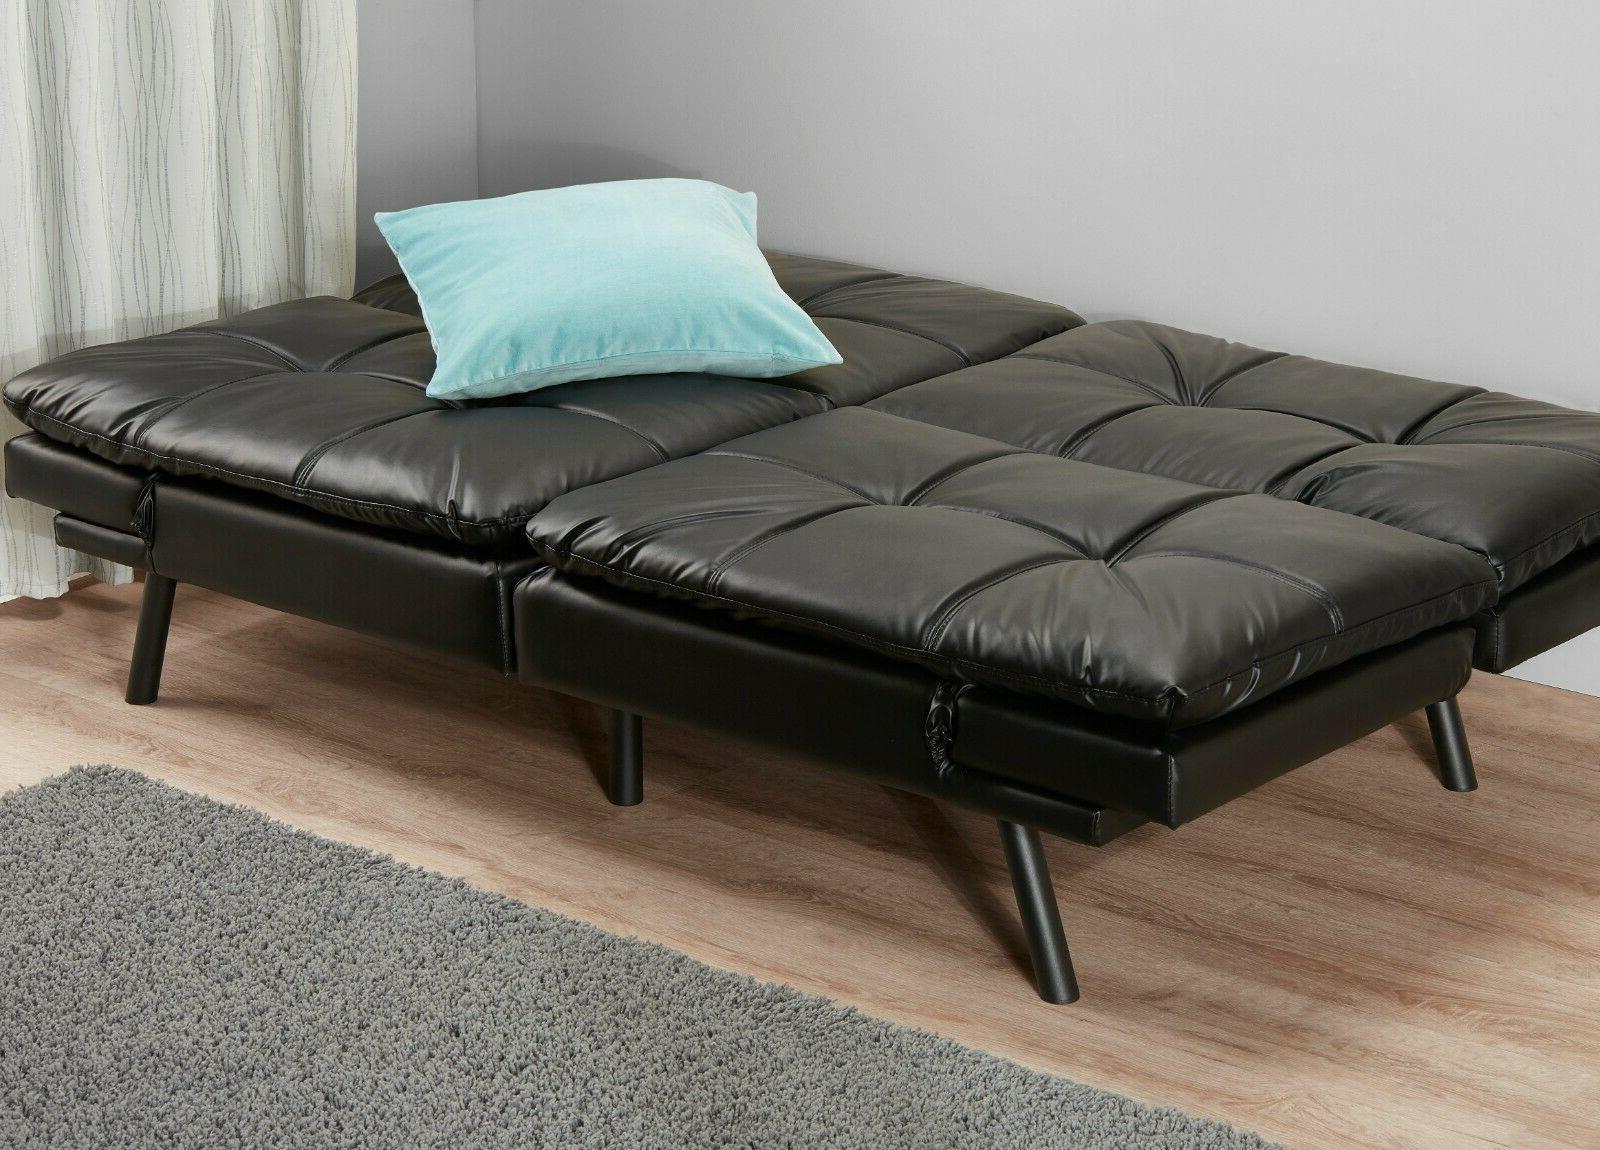 Futon Sofa Sleeper Futons Convertible Lounger For Room